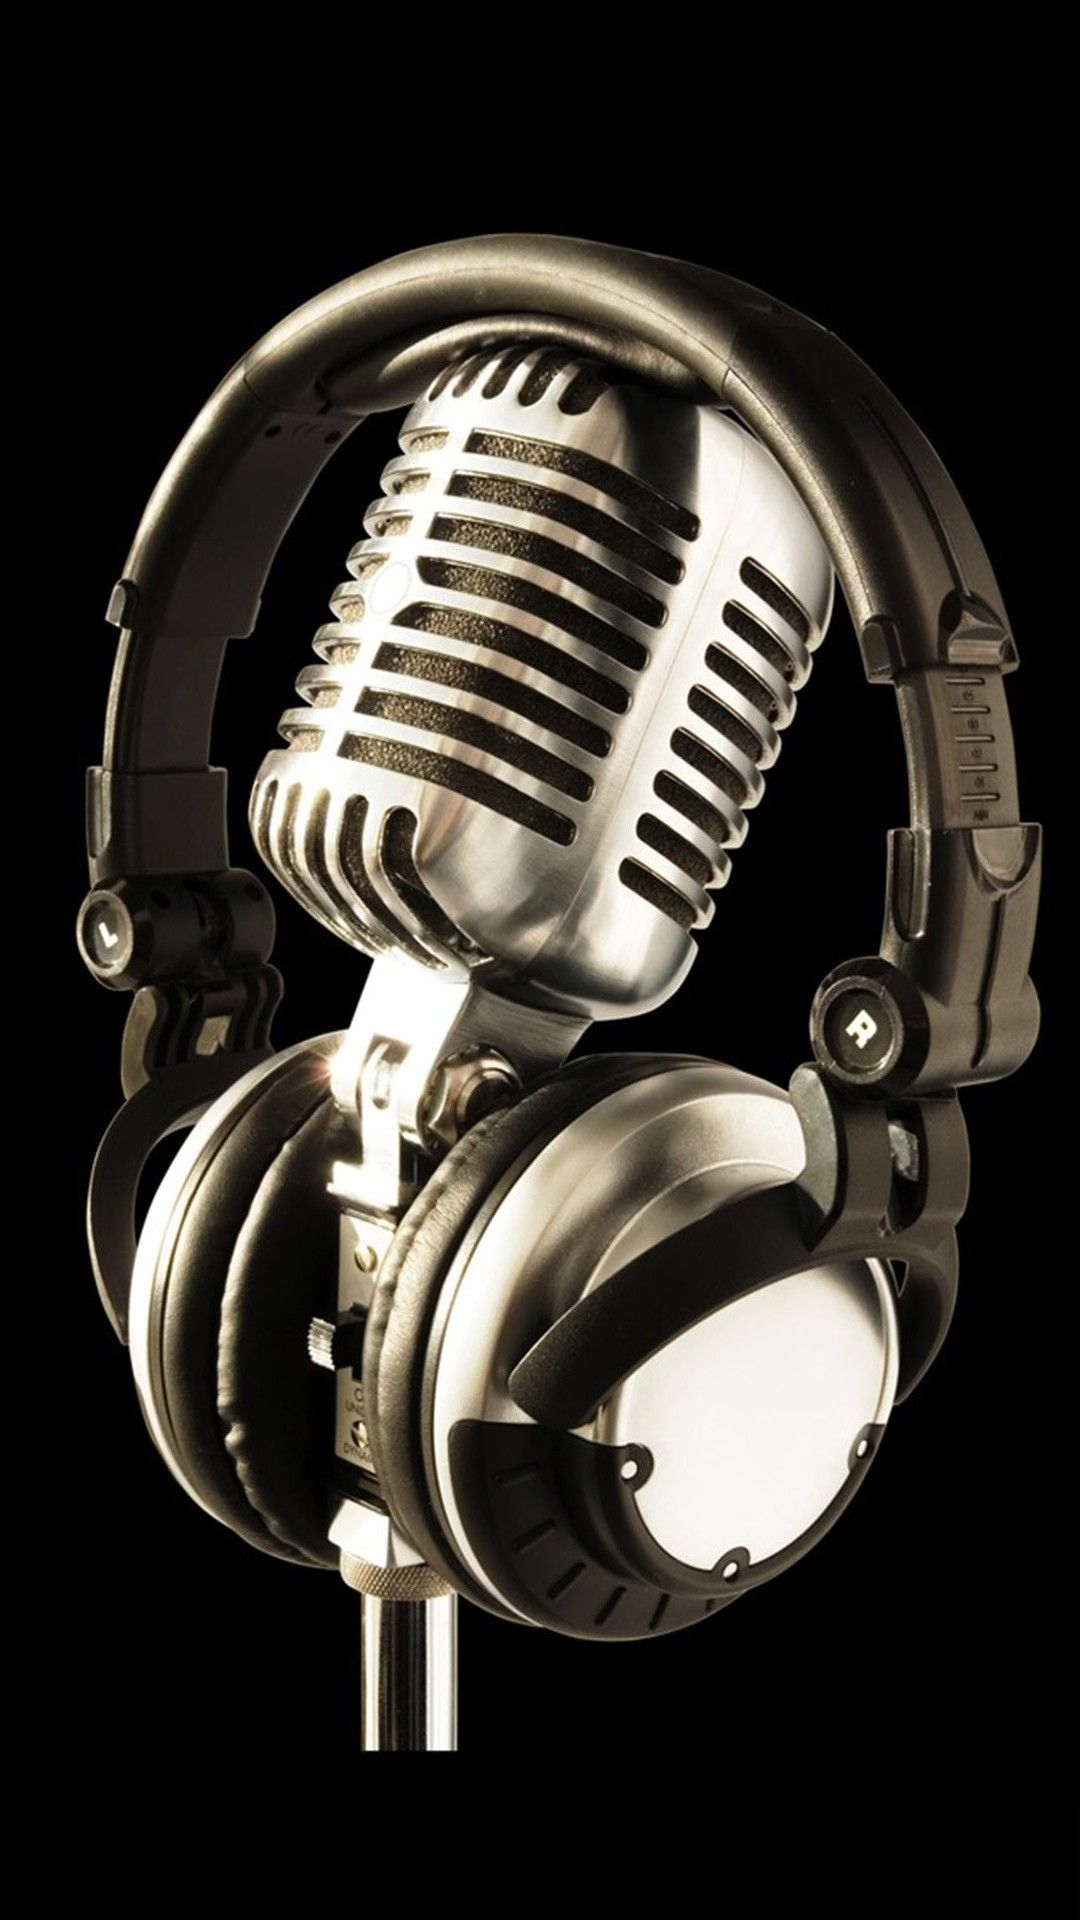 Mic And Headphone Macro Iphone 6 Plus Wallpaper Vintage Microphone Microphone Headphones